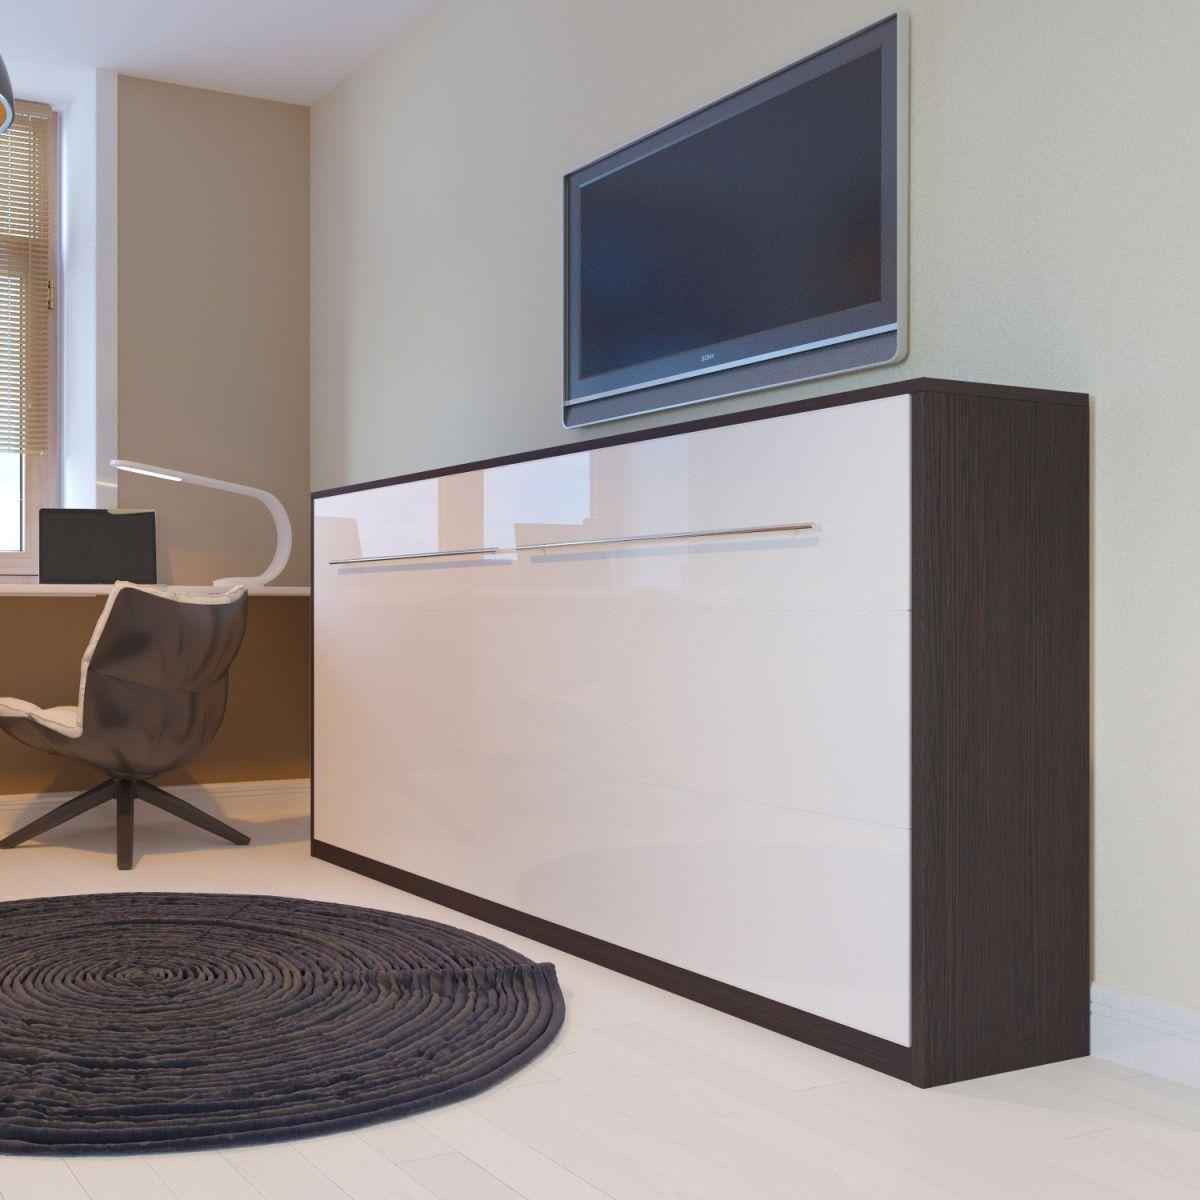 schrankbett 90x200 horizontal wenge wei e hochglanzfront smartbett ebay. Black Bedroom Furniture Sets. Home Design Ideas